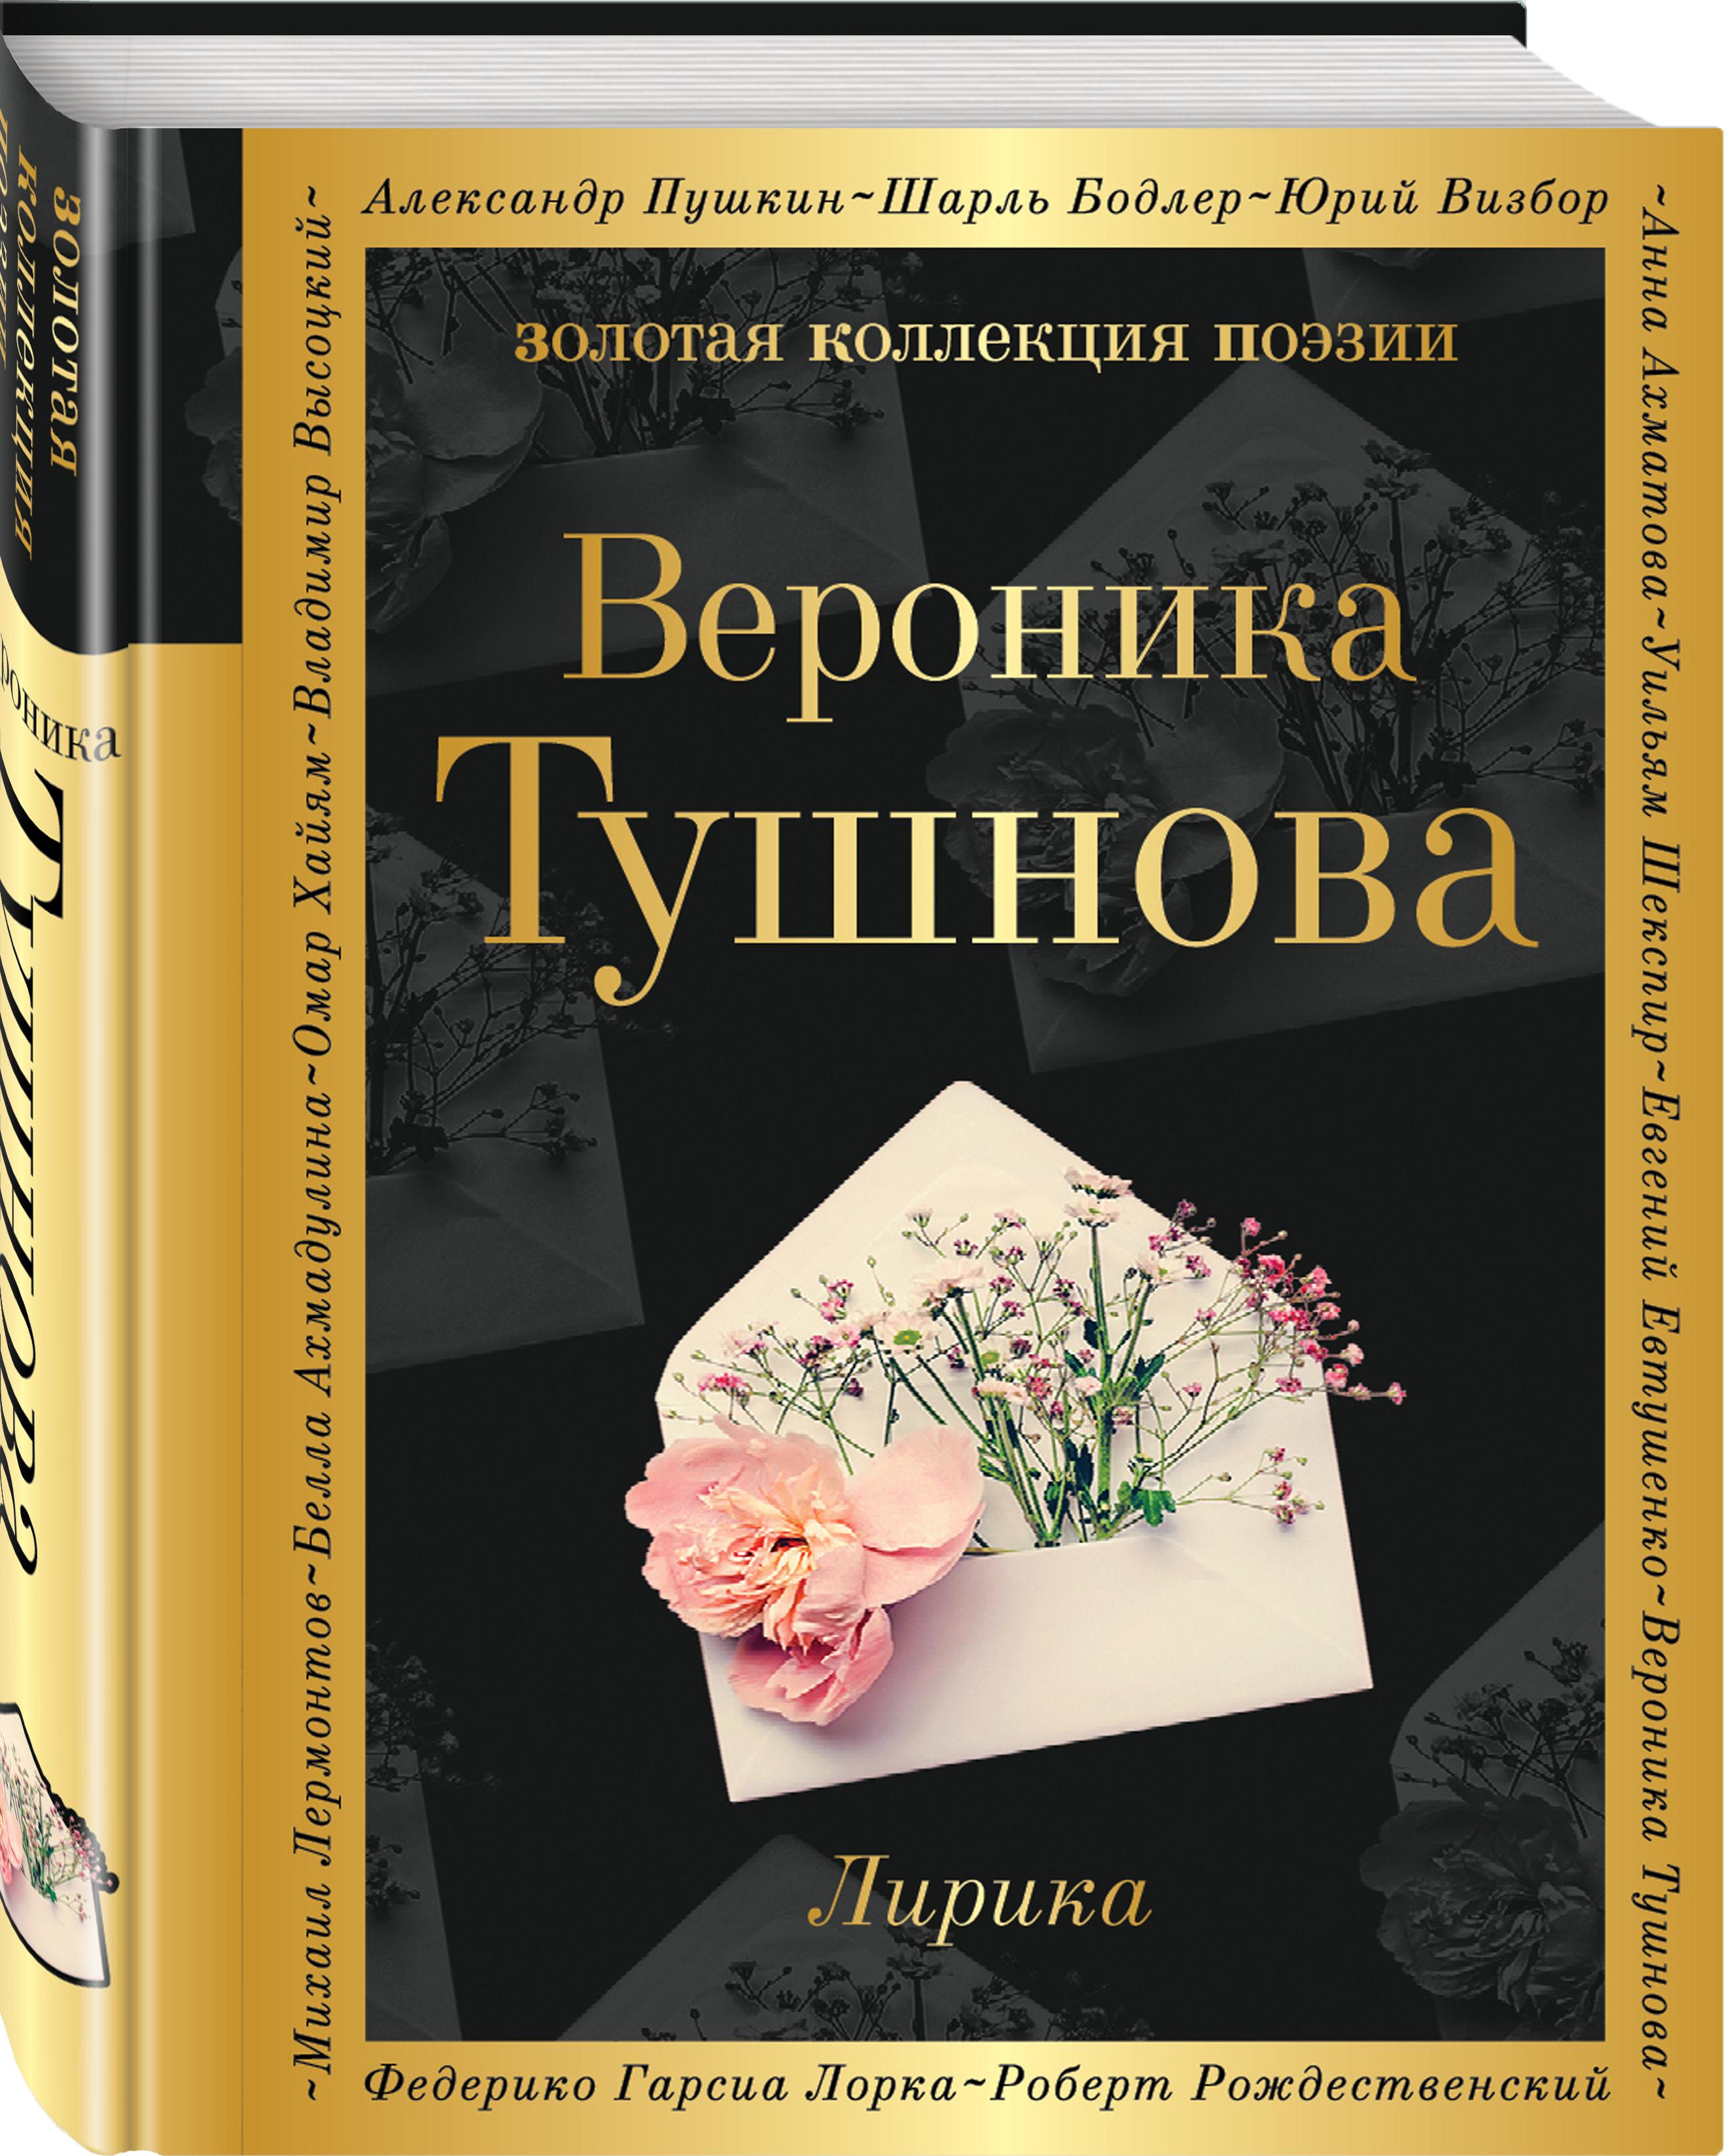 Тушнова В.М. Лирика ISBN: 978-5-04-091563-7 тушнова в лирика